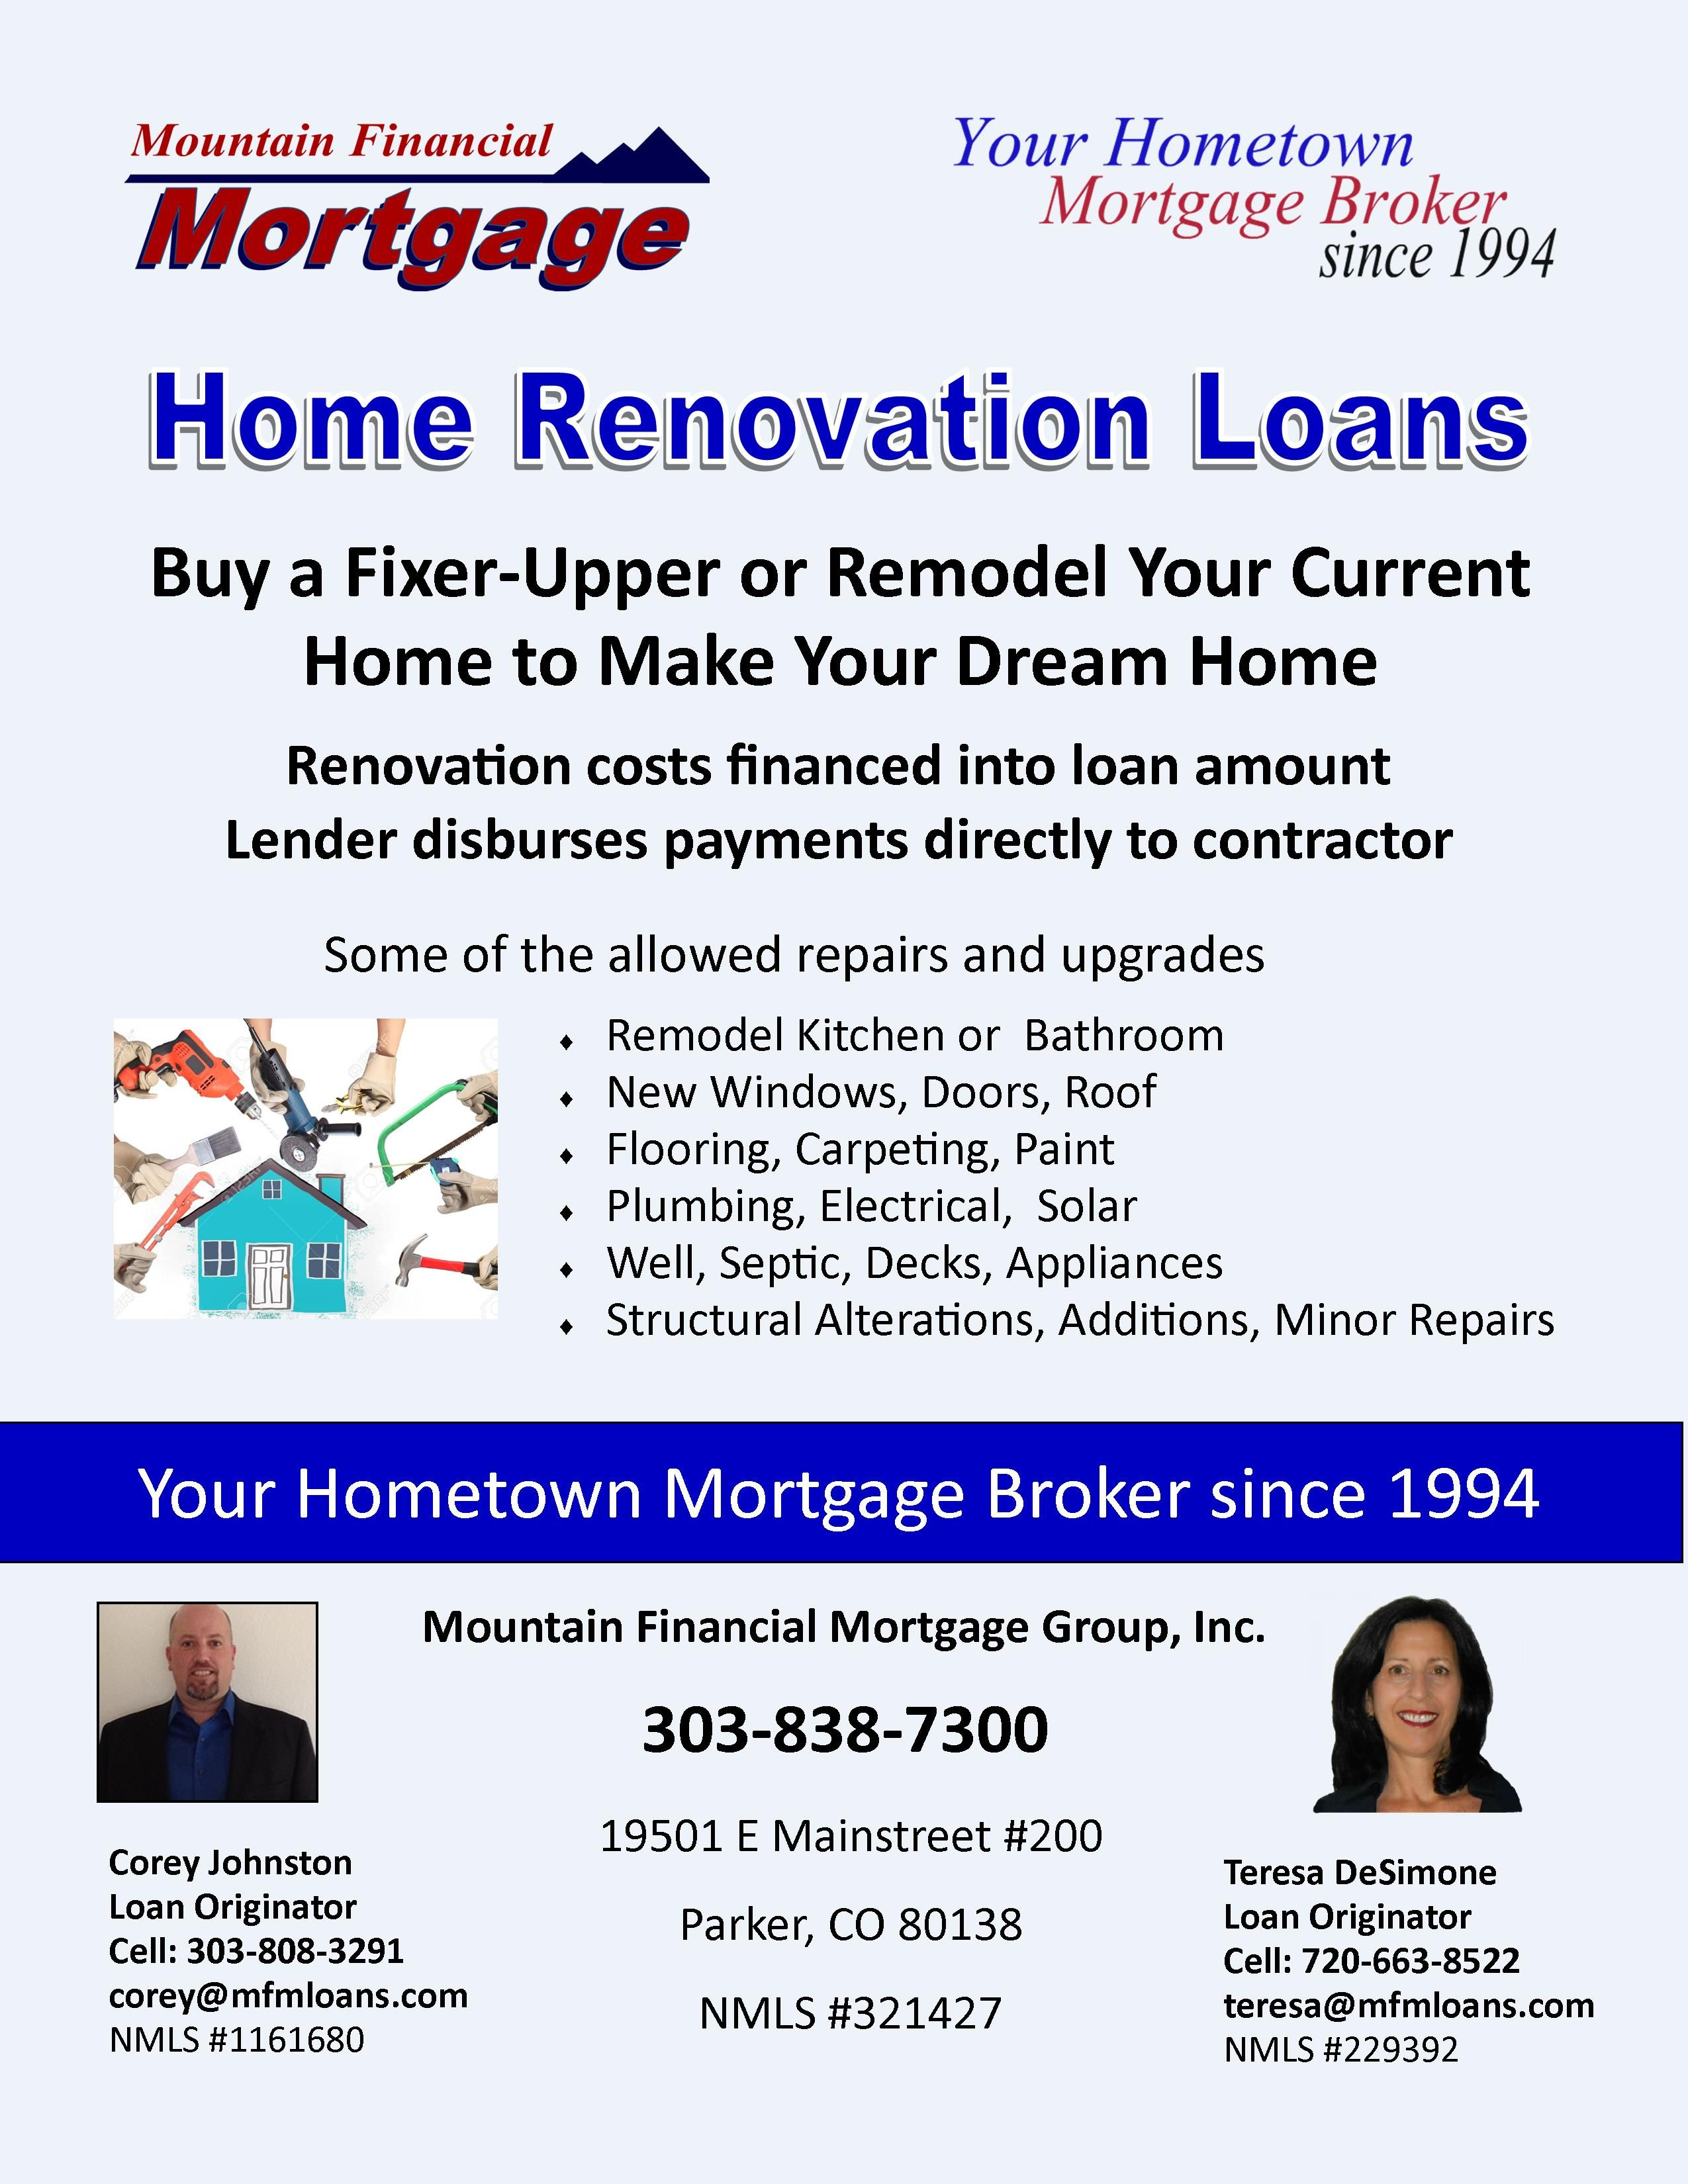 Home renovation loans home renovation loan home